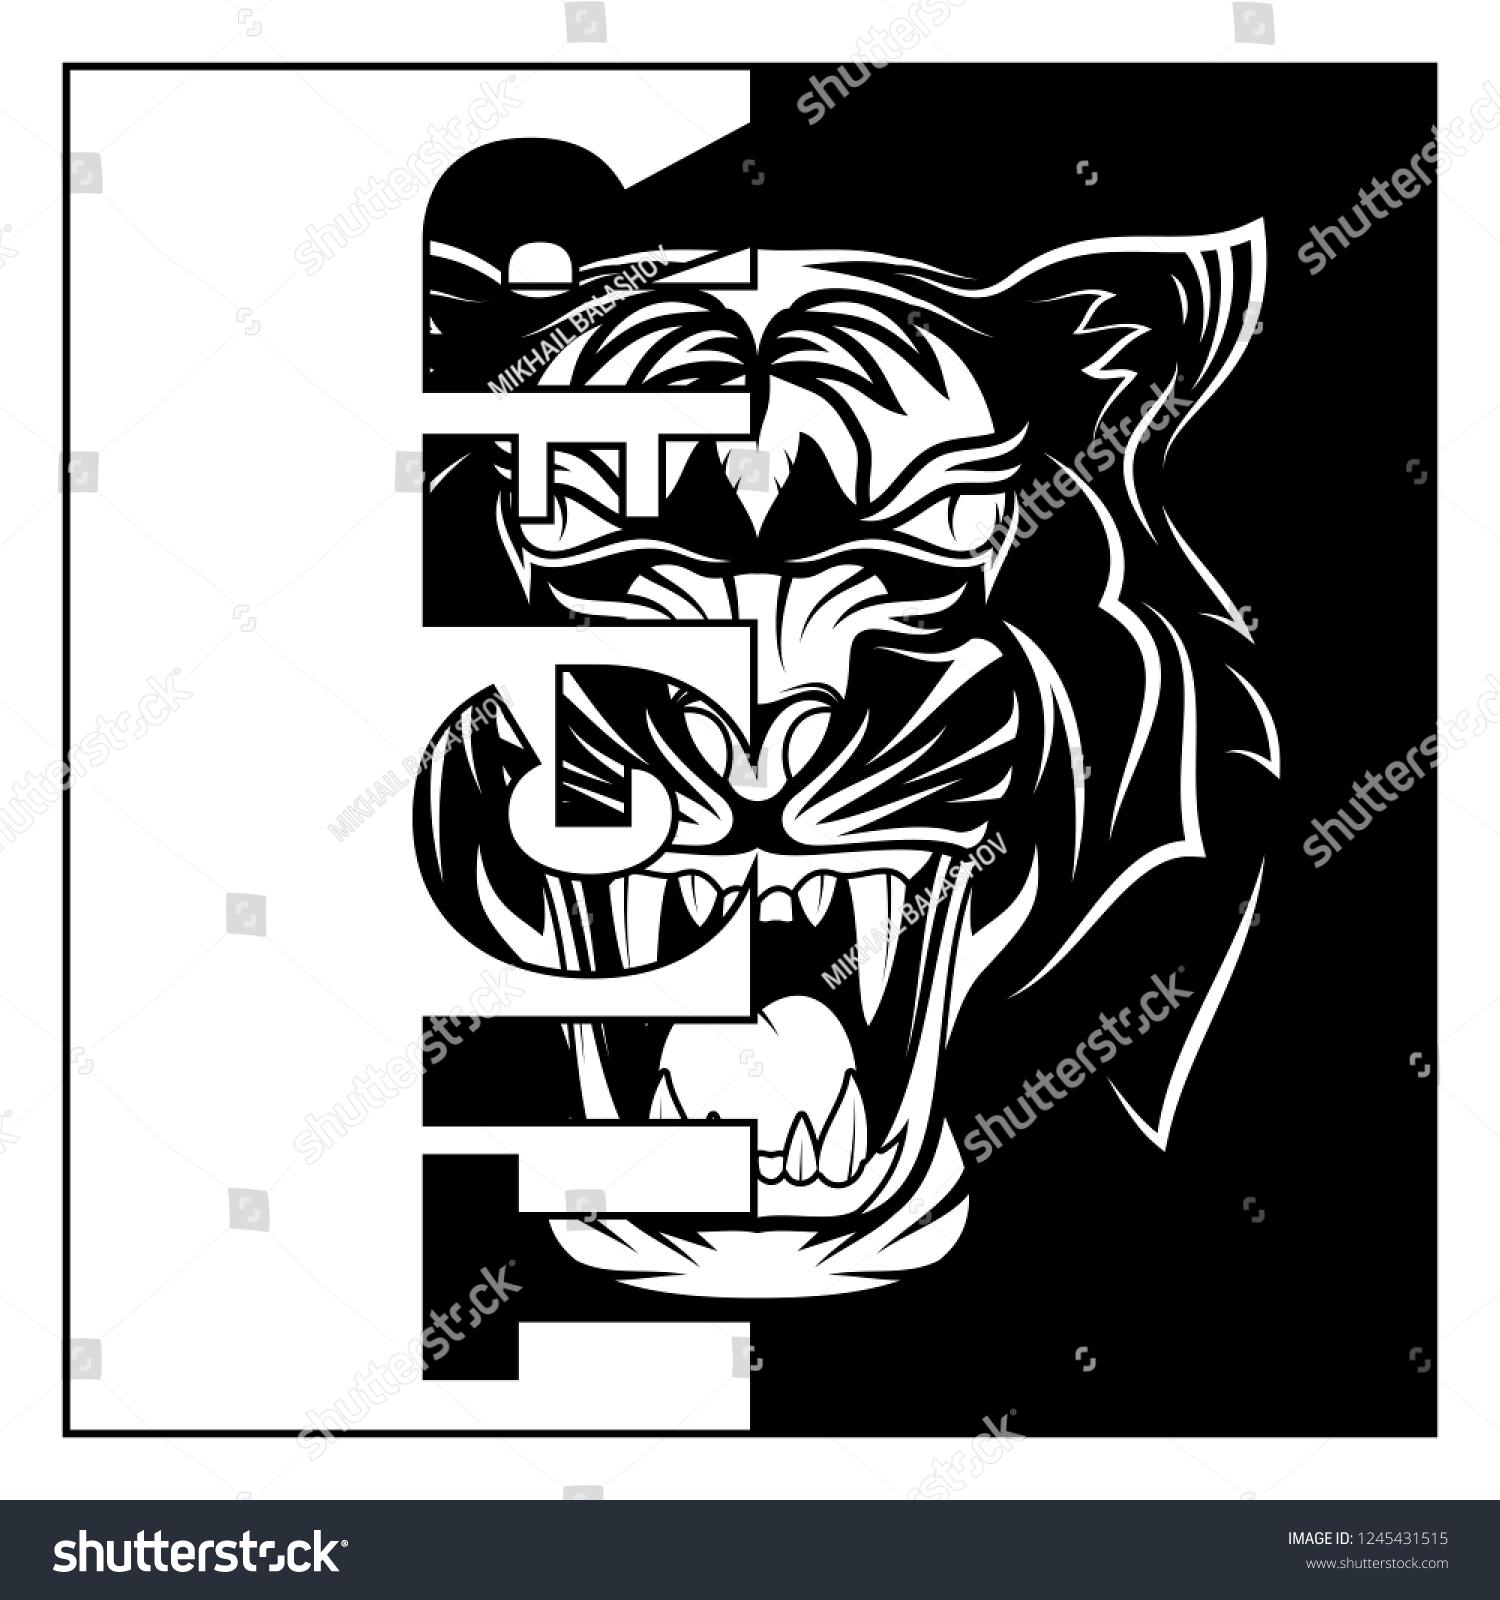 Vector Image Head Tiger Striped Predator เวกเตอร์สต็อก (ปลอด